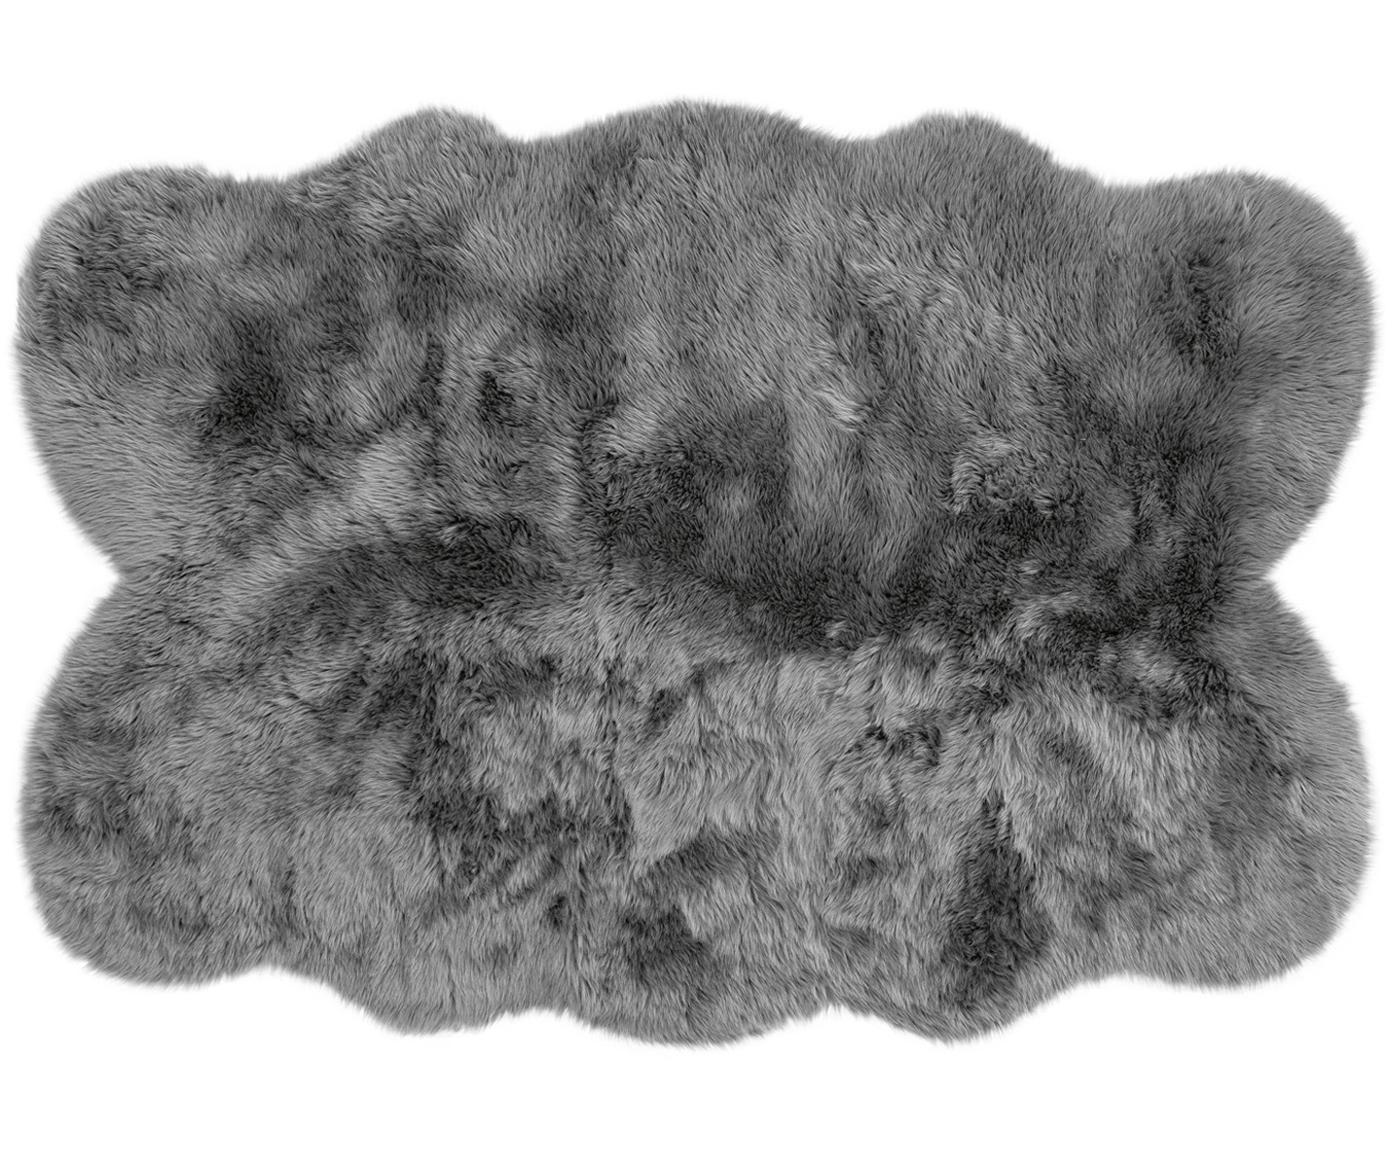 Imitatie schapenvacht Elmo, glad, Bovenzijde: 50% acryl, 50% polyester, Onderzijde: polyester, Grijs, 140 x 200 cm